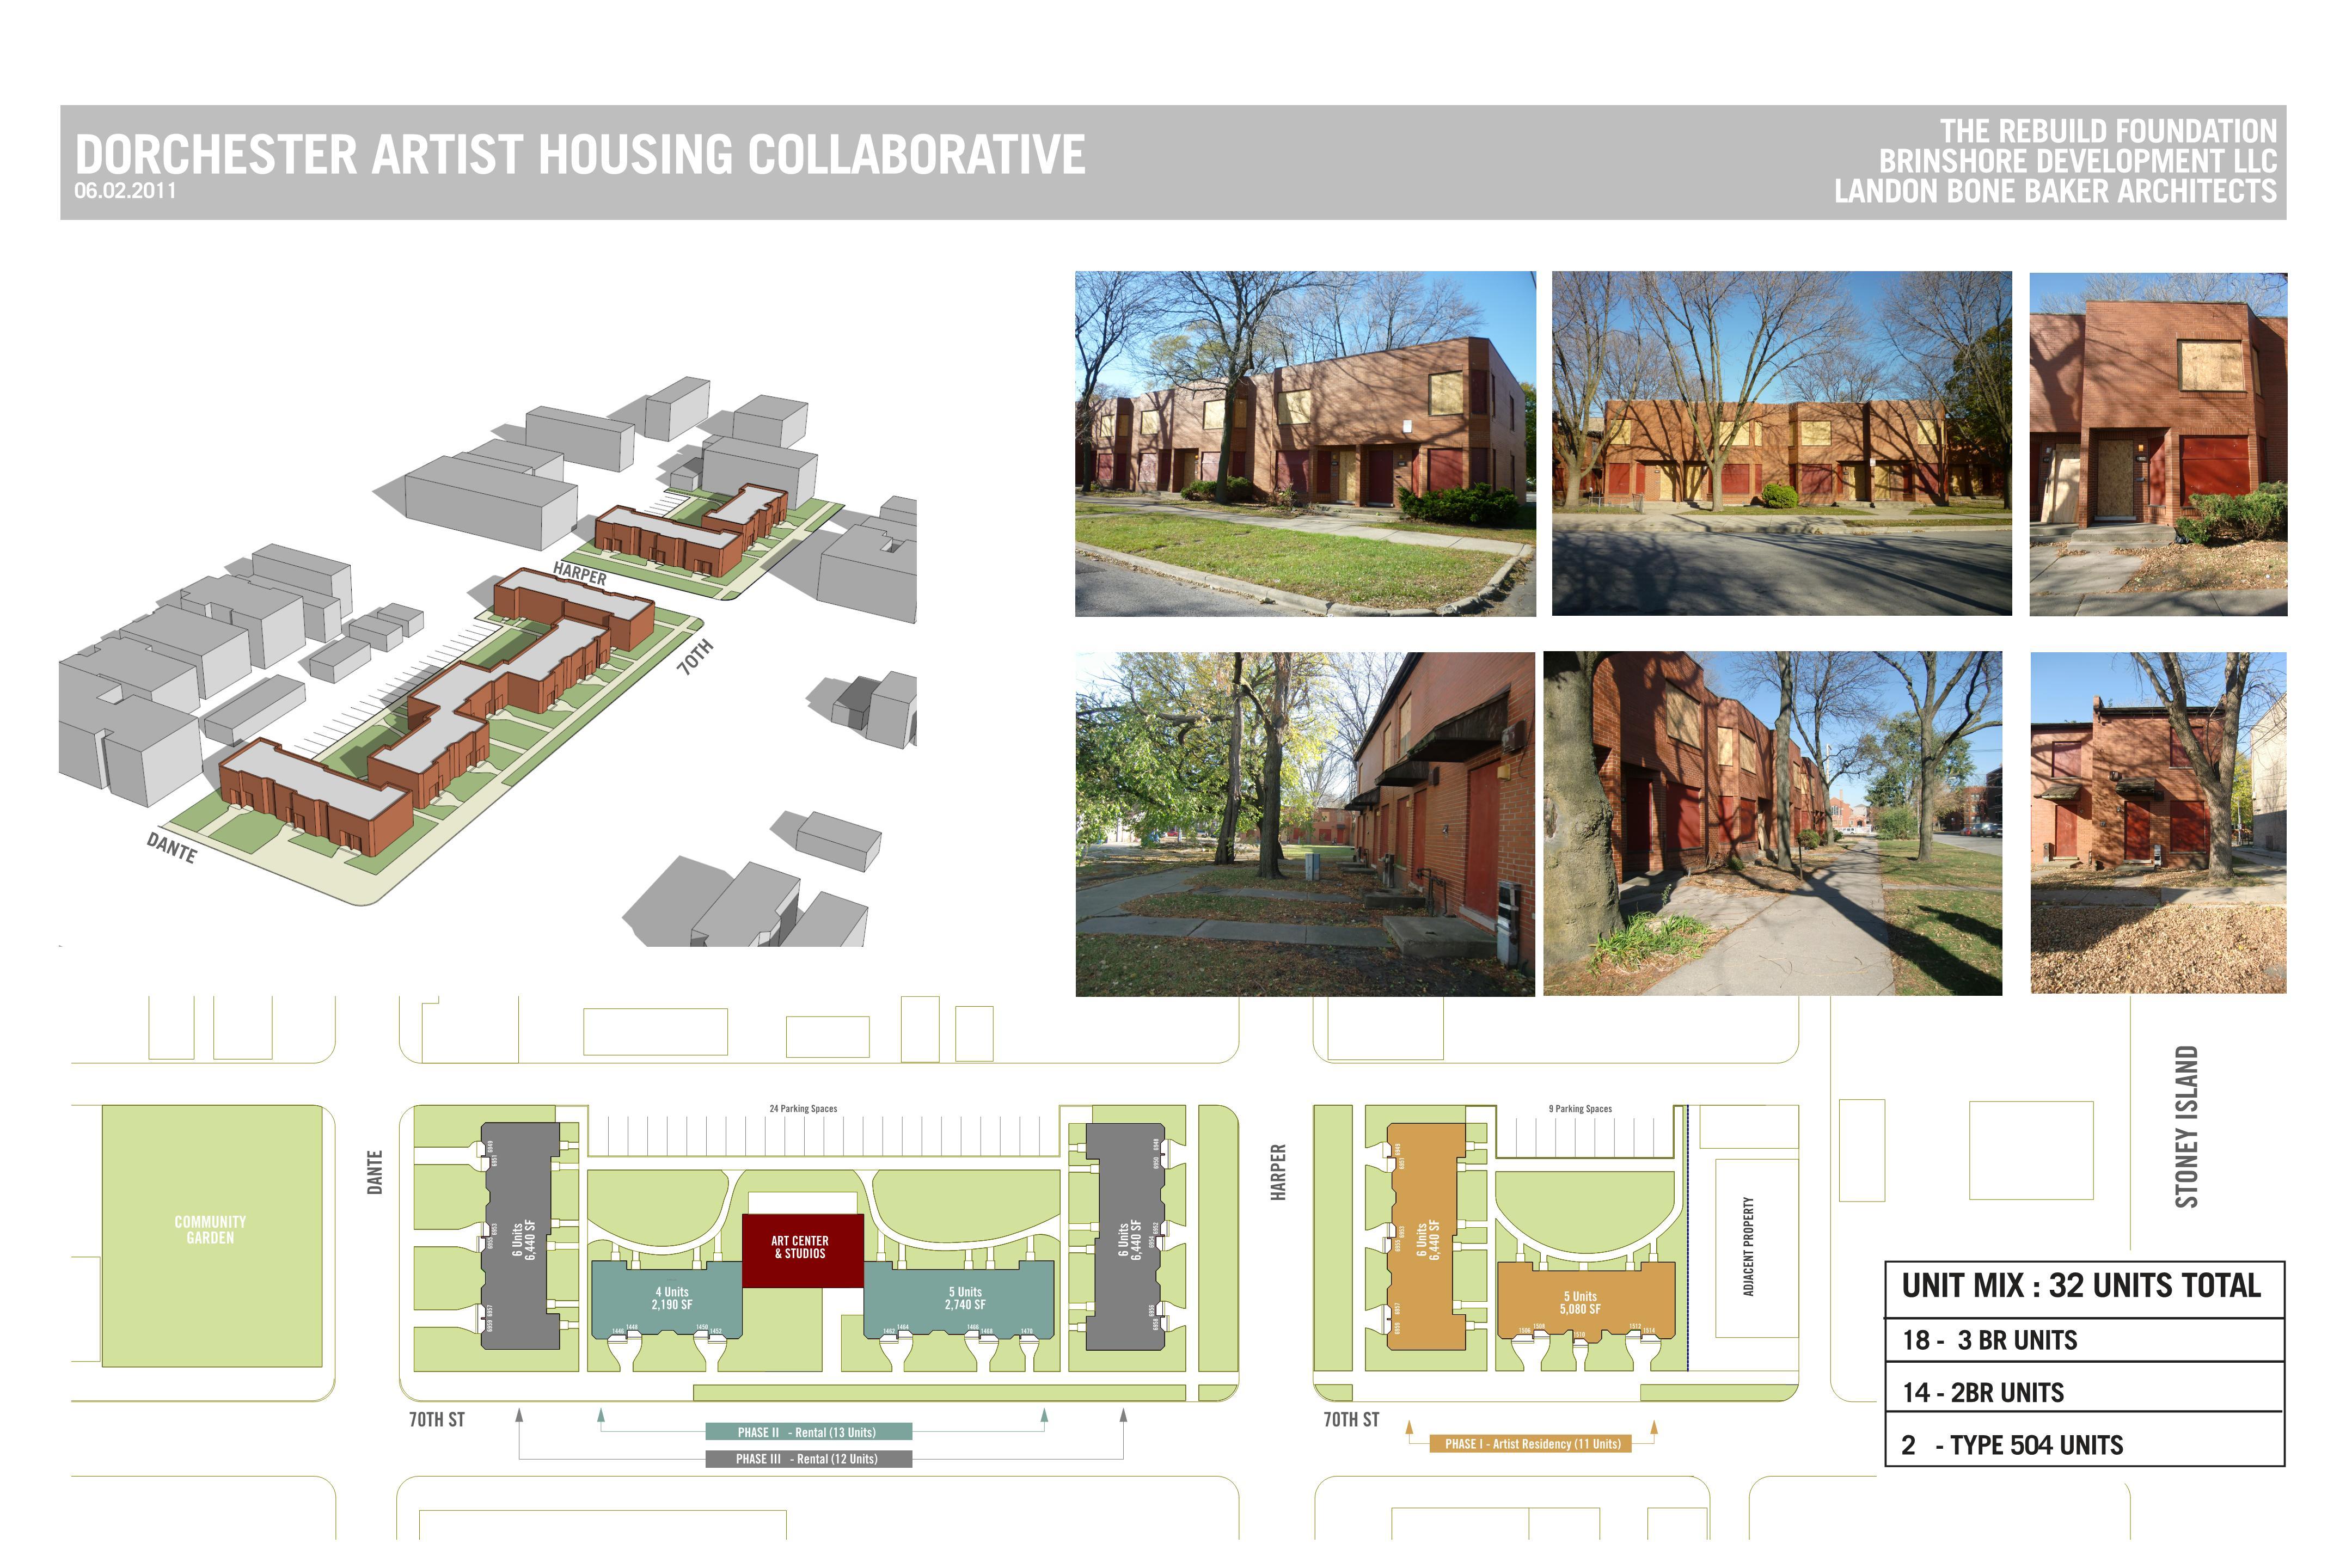 Chicago Housing Authority | Chicago News | WTTW